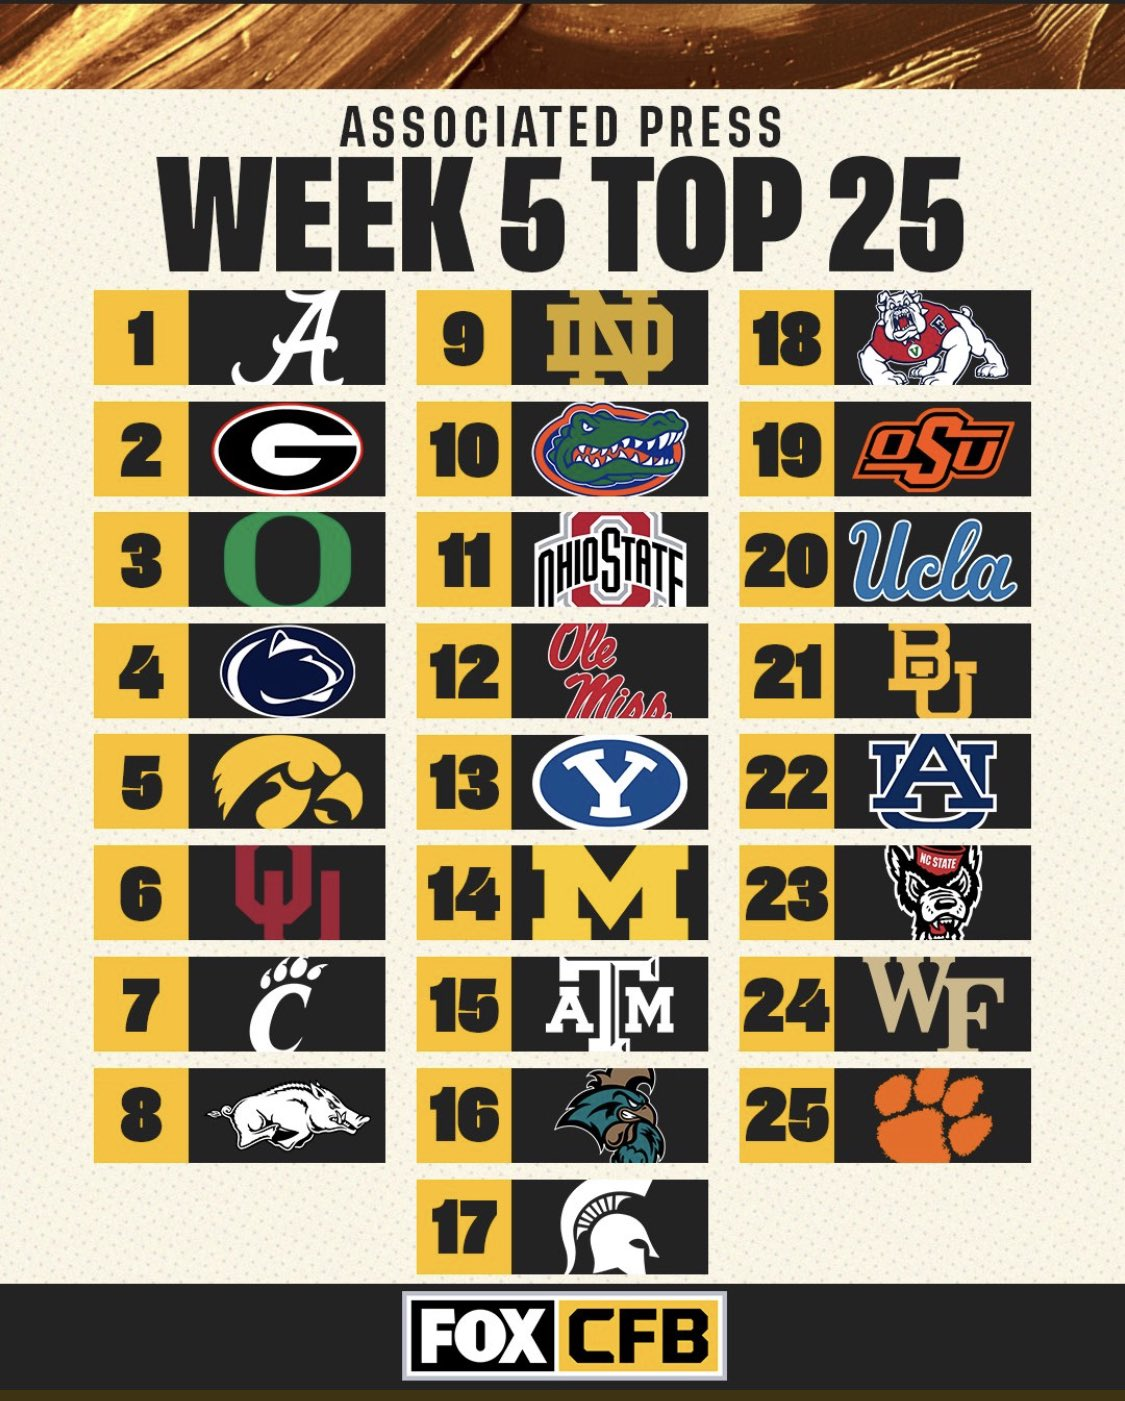 Baylor ranked No. 21